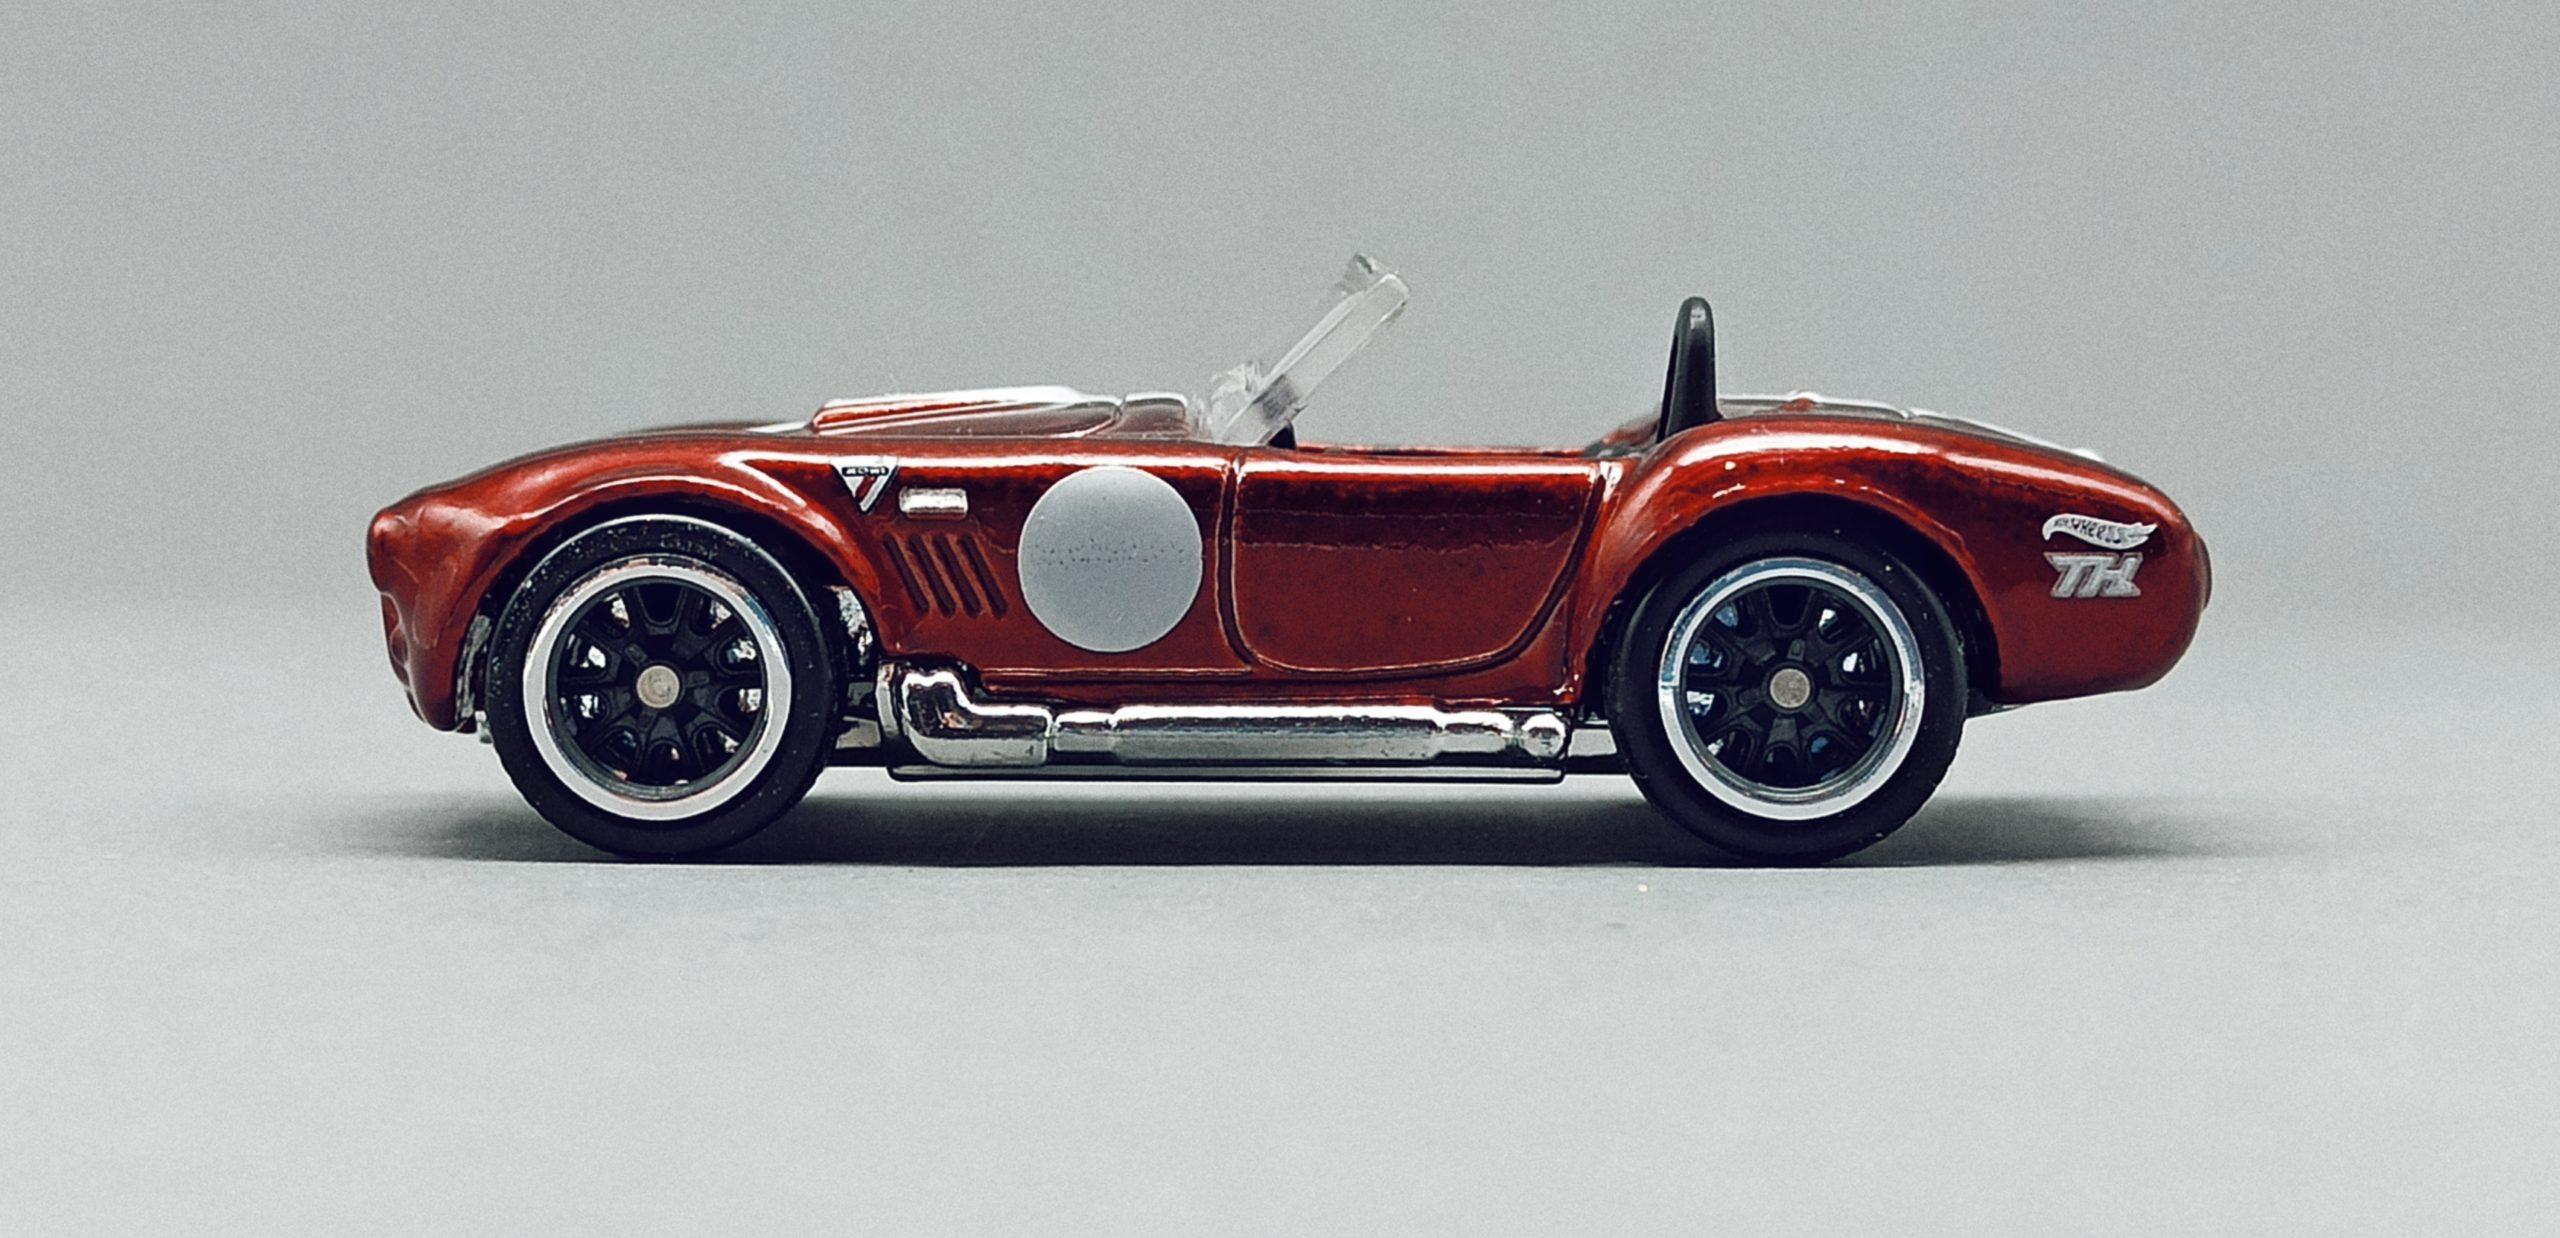 Hot Wheels Classic Cobra (Shelby Cobra 427 S/C) (GTD13) 2021 (250/250) Muscle Mania (10/10) spectraflame red Super Treasure Hunt (STH) side